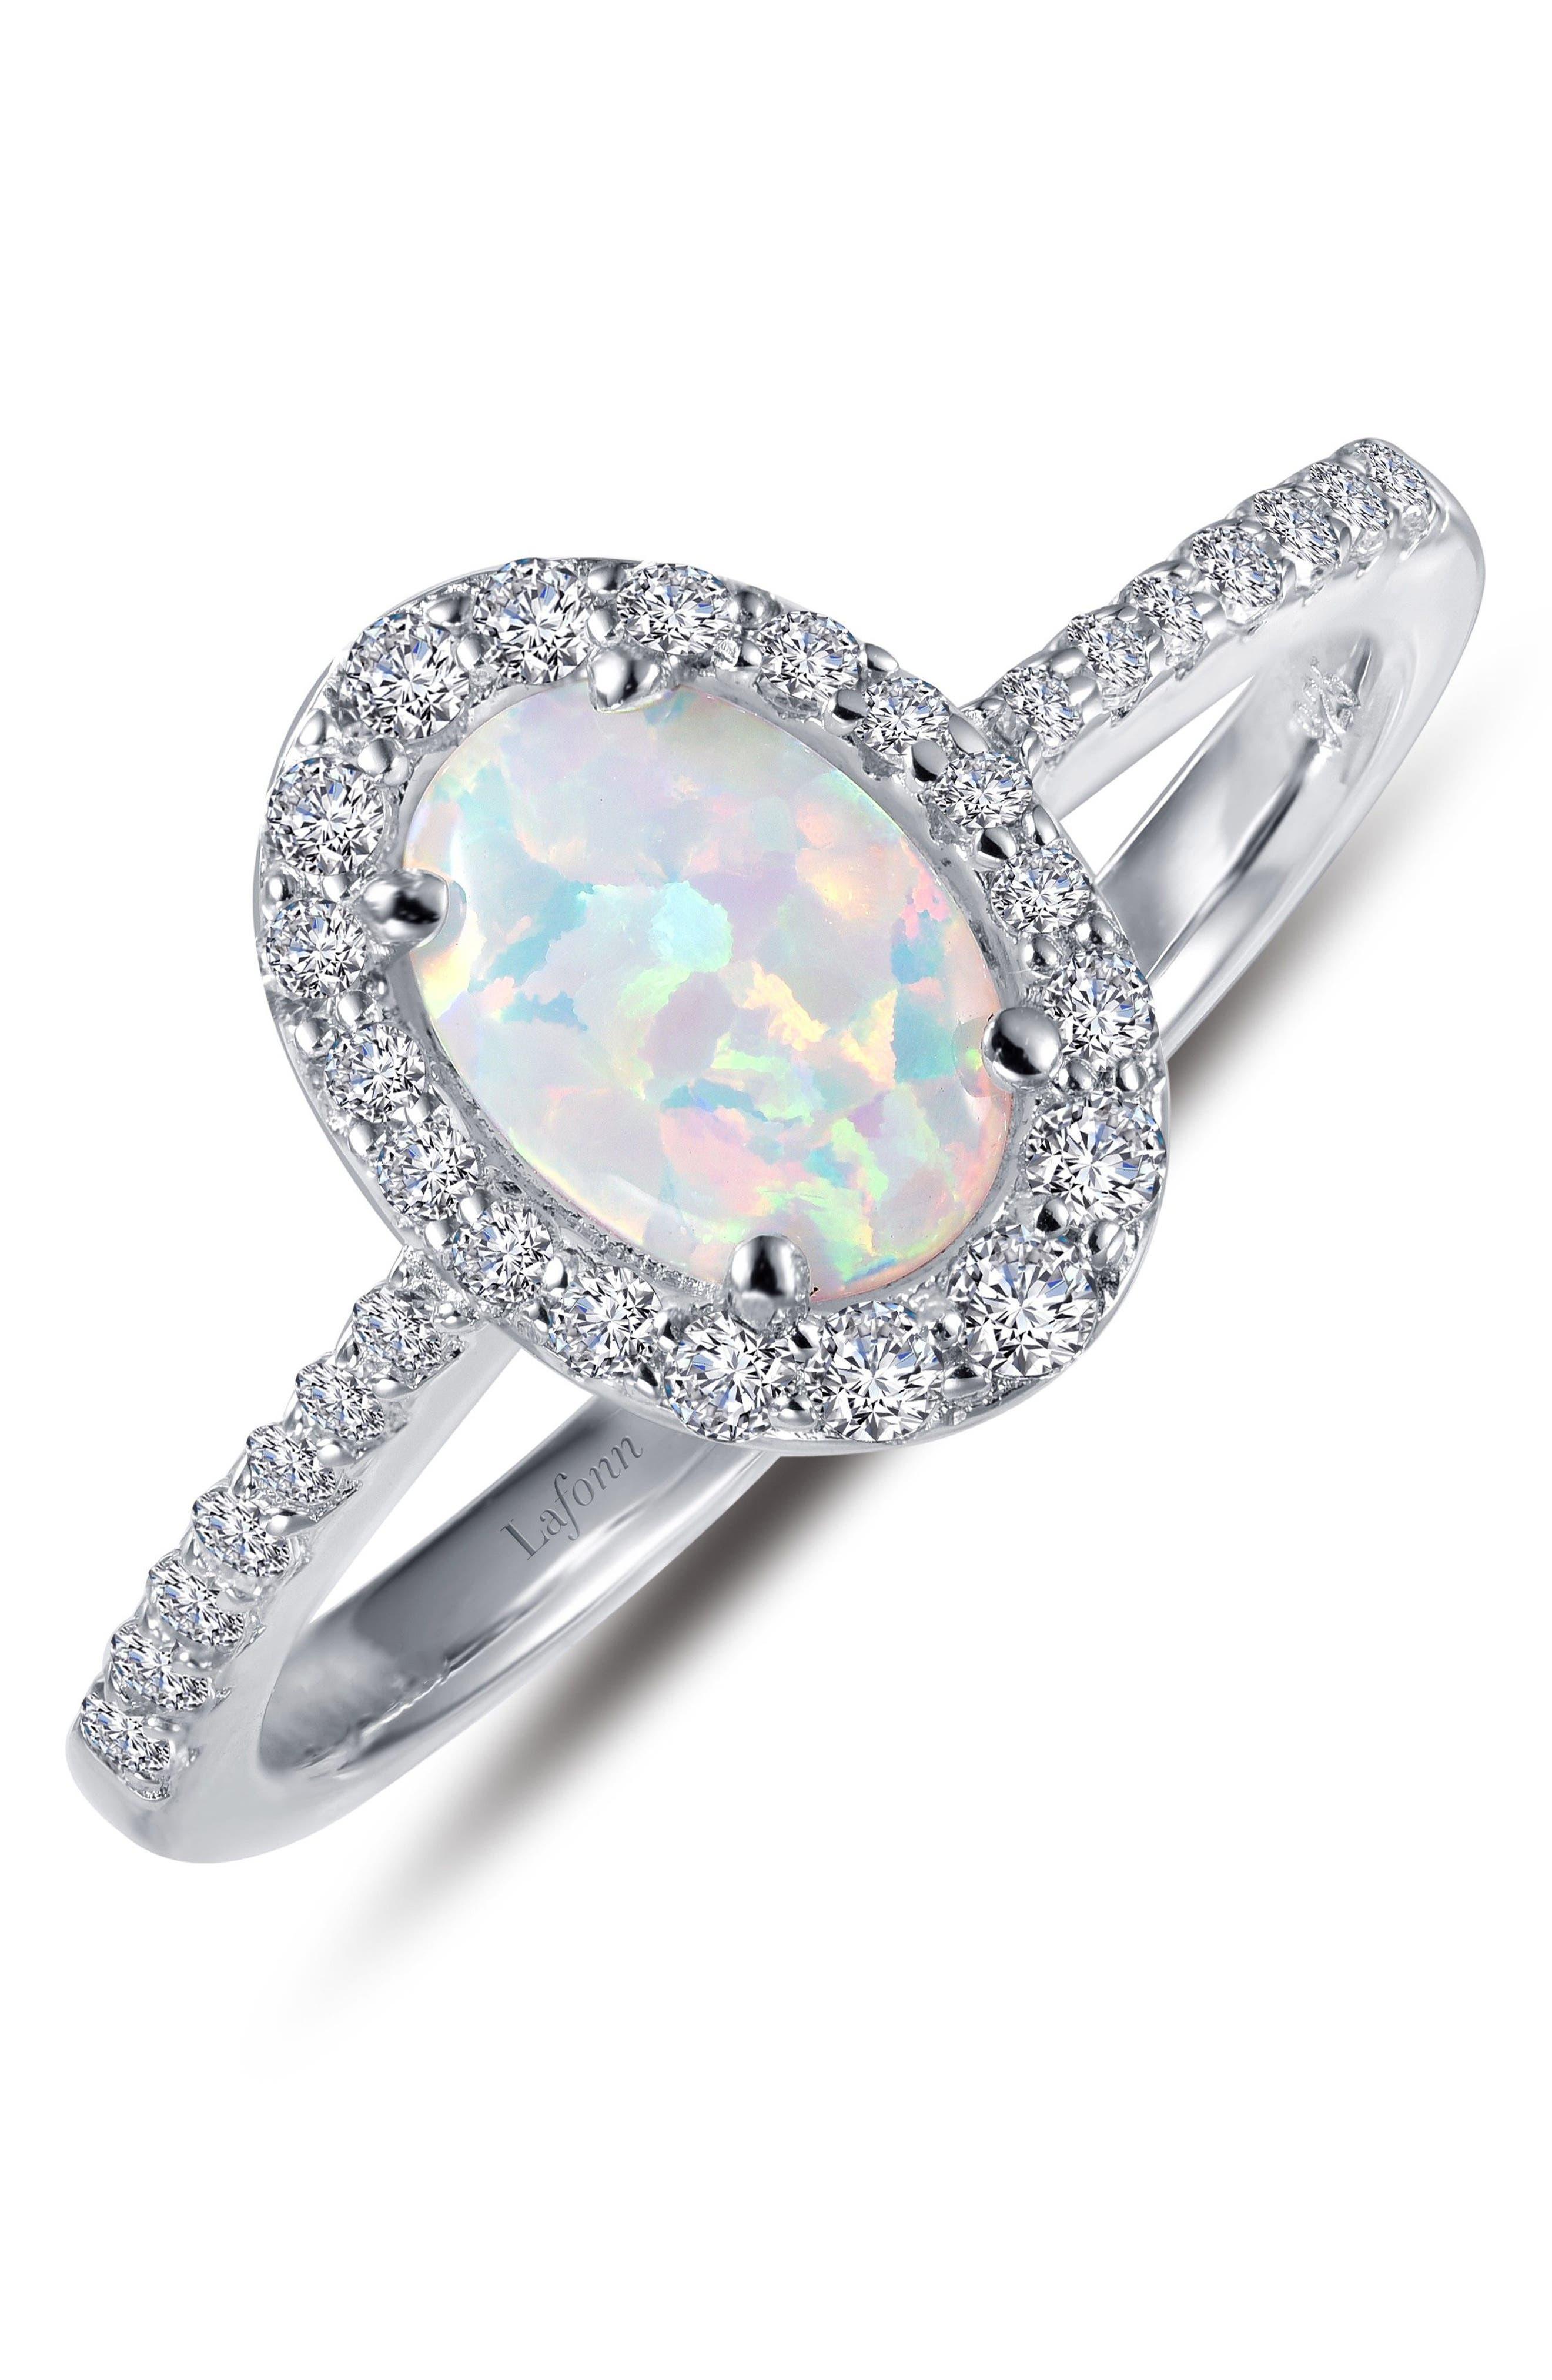 Alternate Image 1 Selected - Lafonn Simulated Diamond & Opal Ring